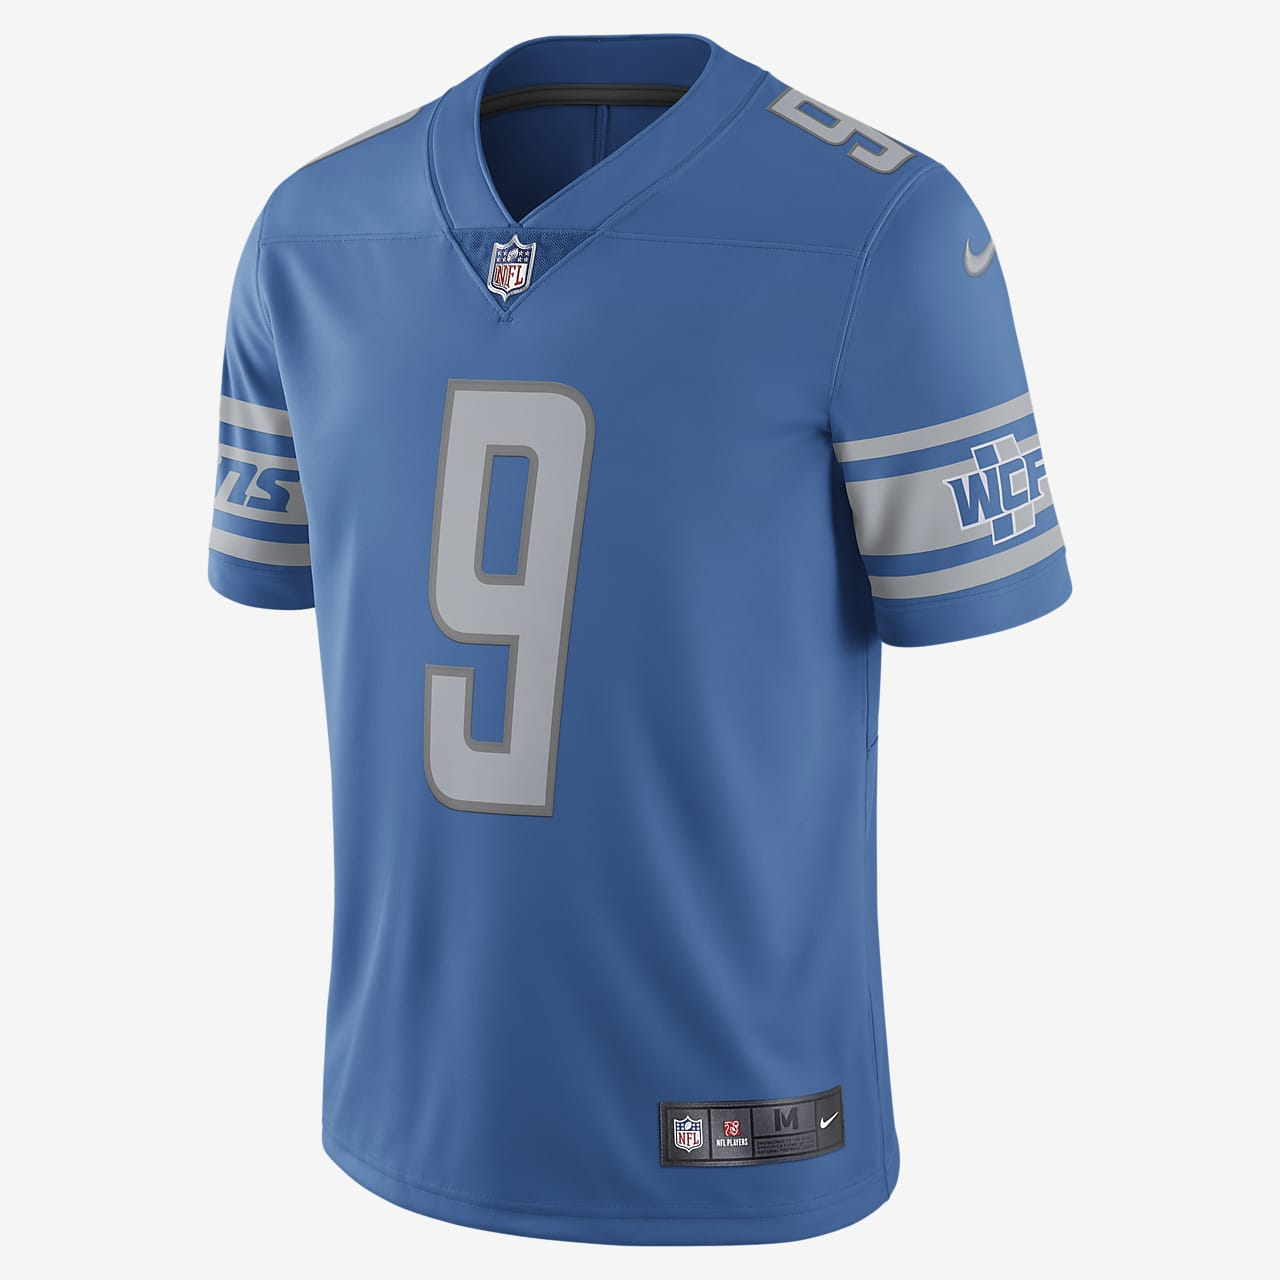 NFL Detroit Lions (Matthew Stafford) Men's Limited Vapor Untouchable Football Jersey